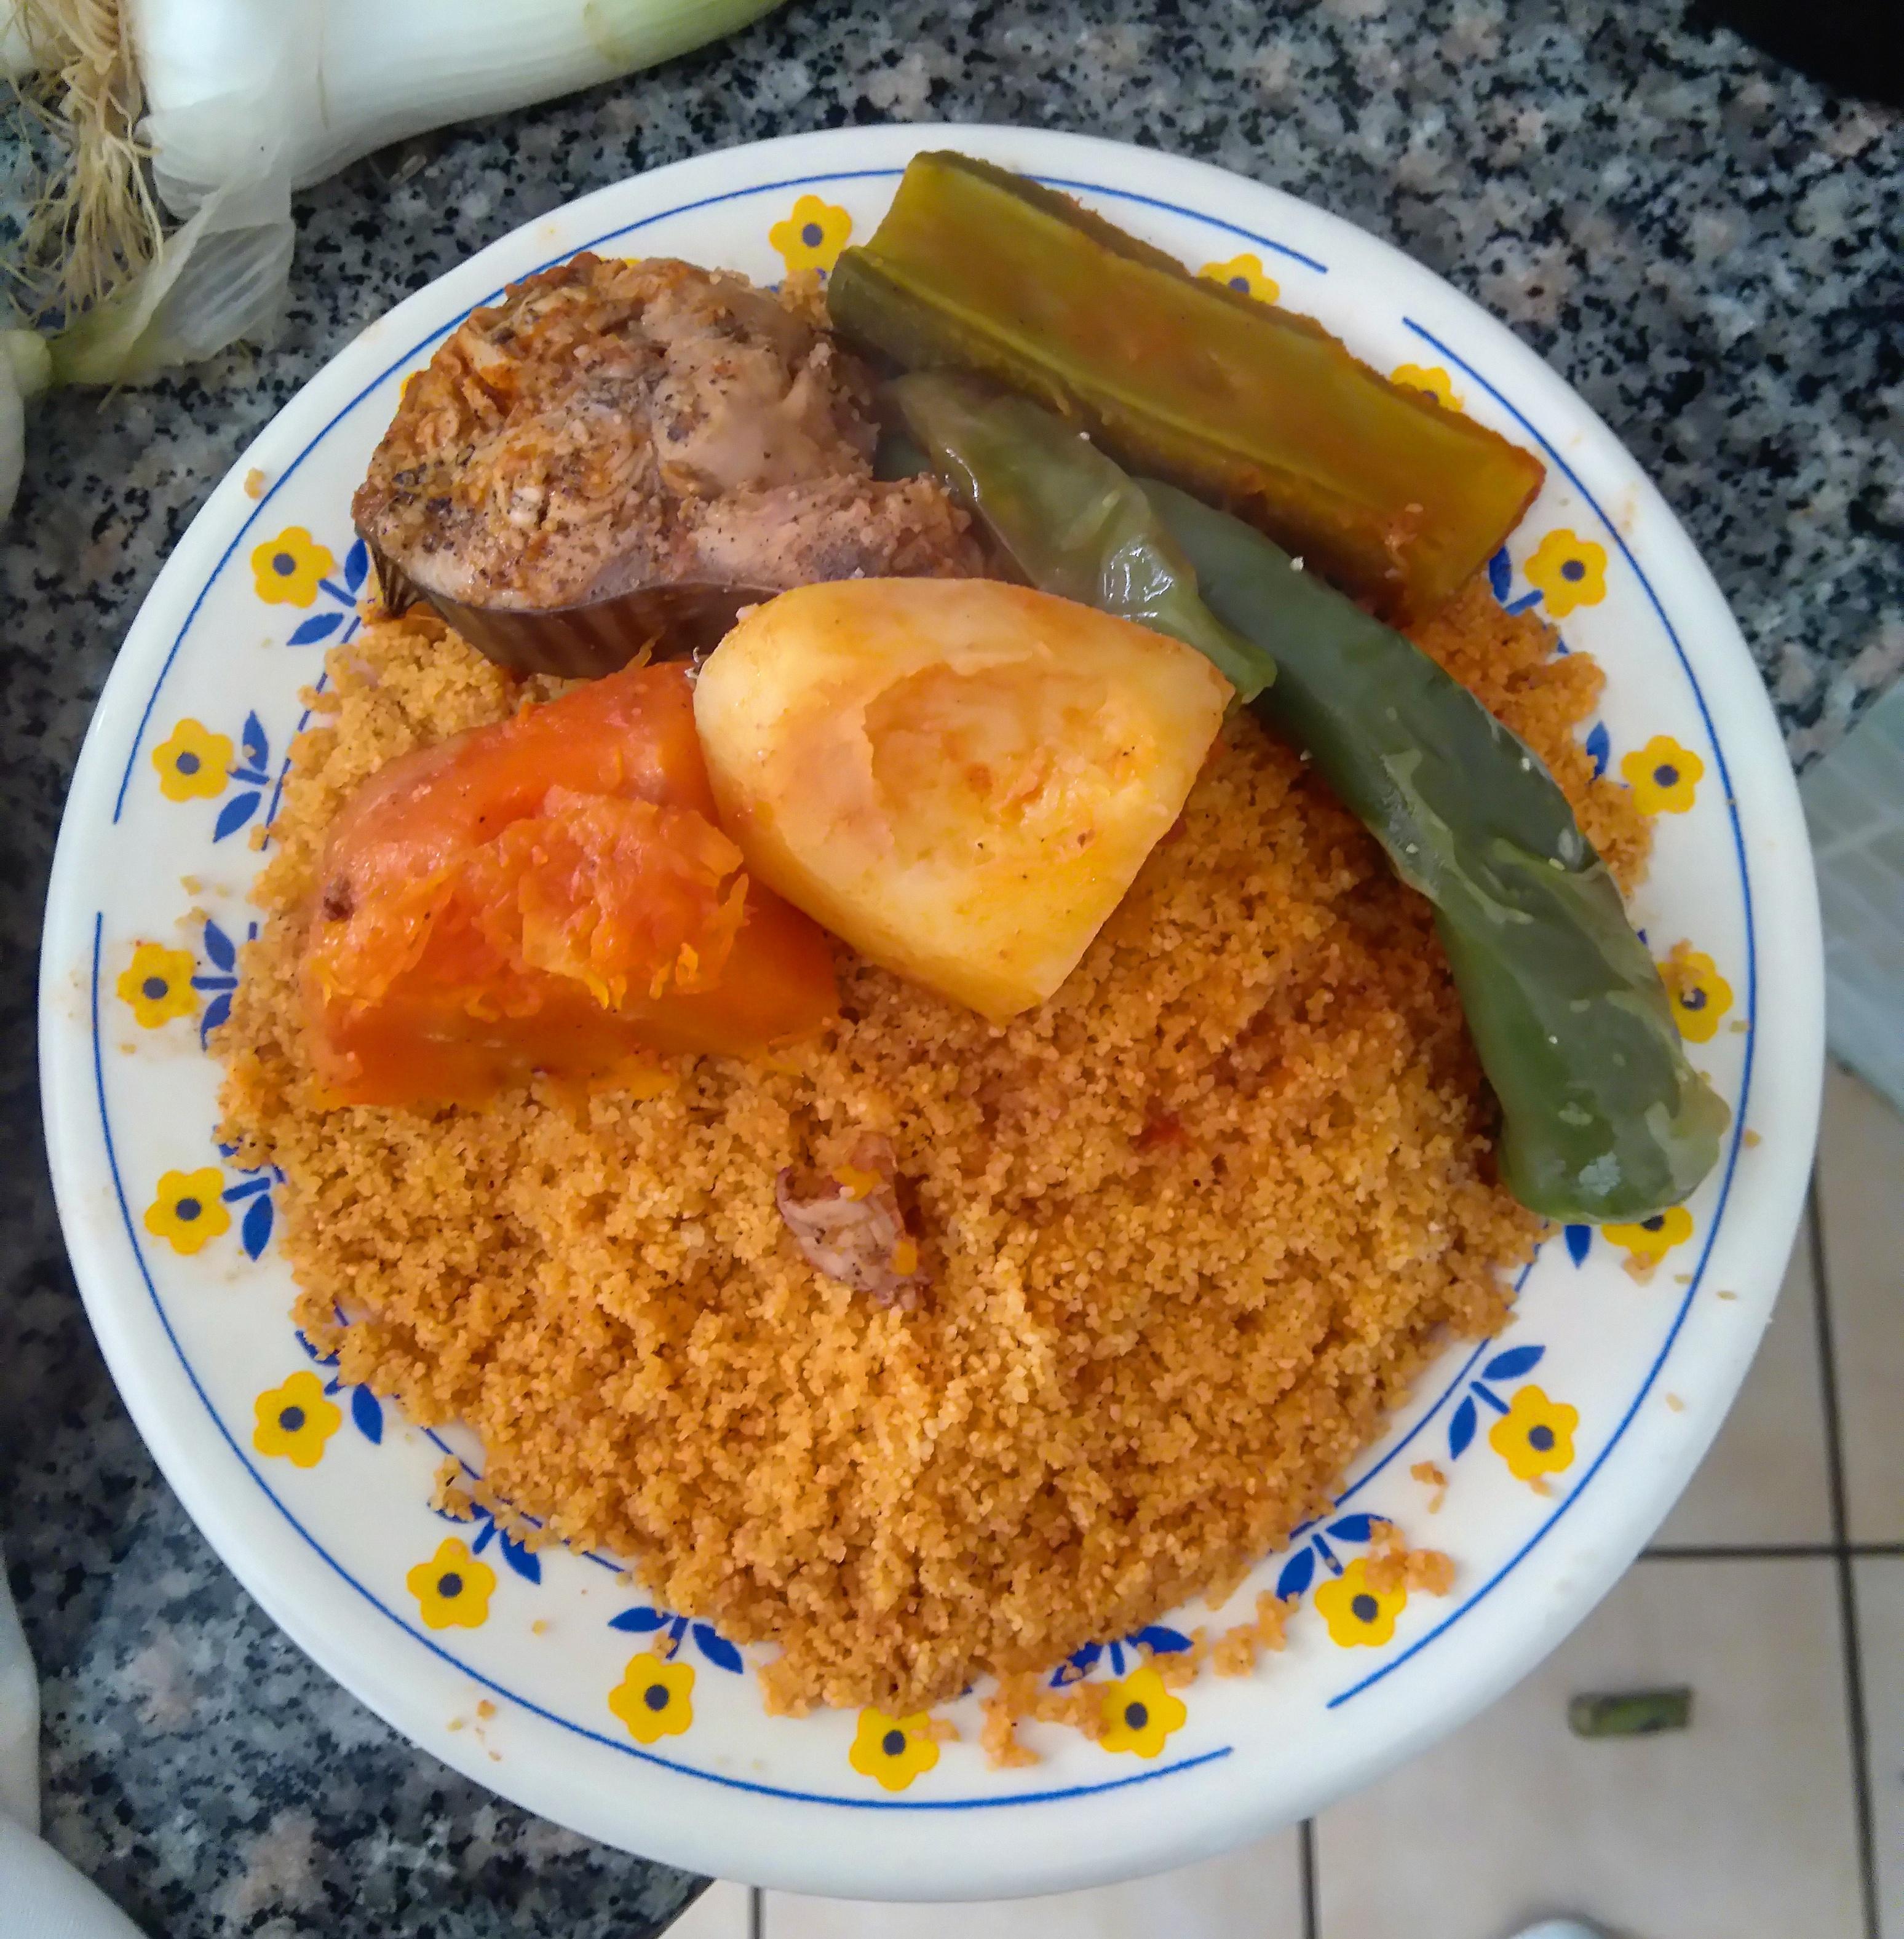 Image De Plat De Cuisine file:plat de couscous, sayada 25 mars 2017 - wikimedia